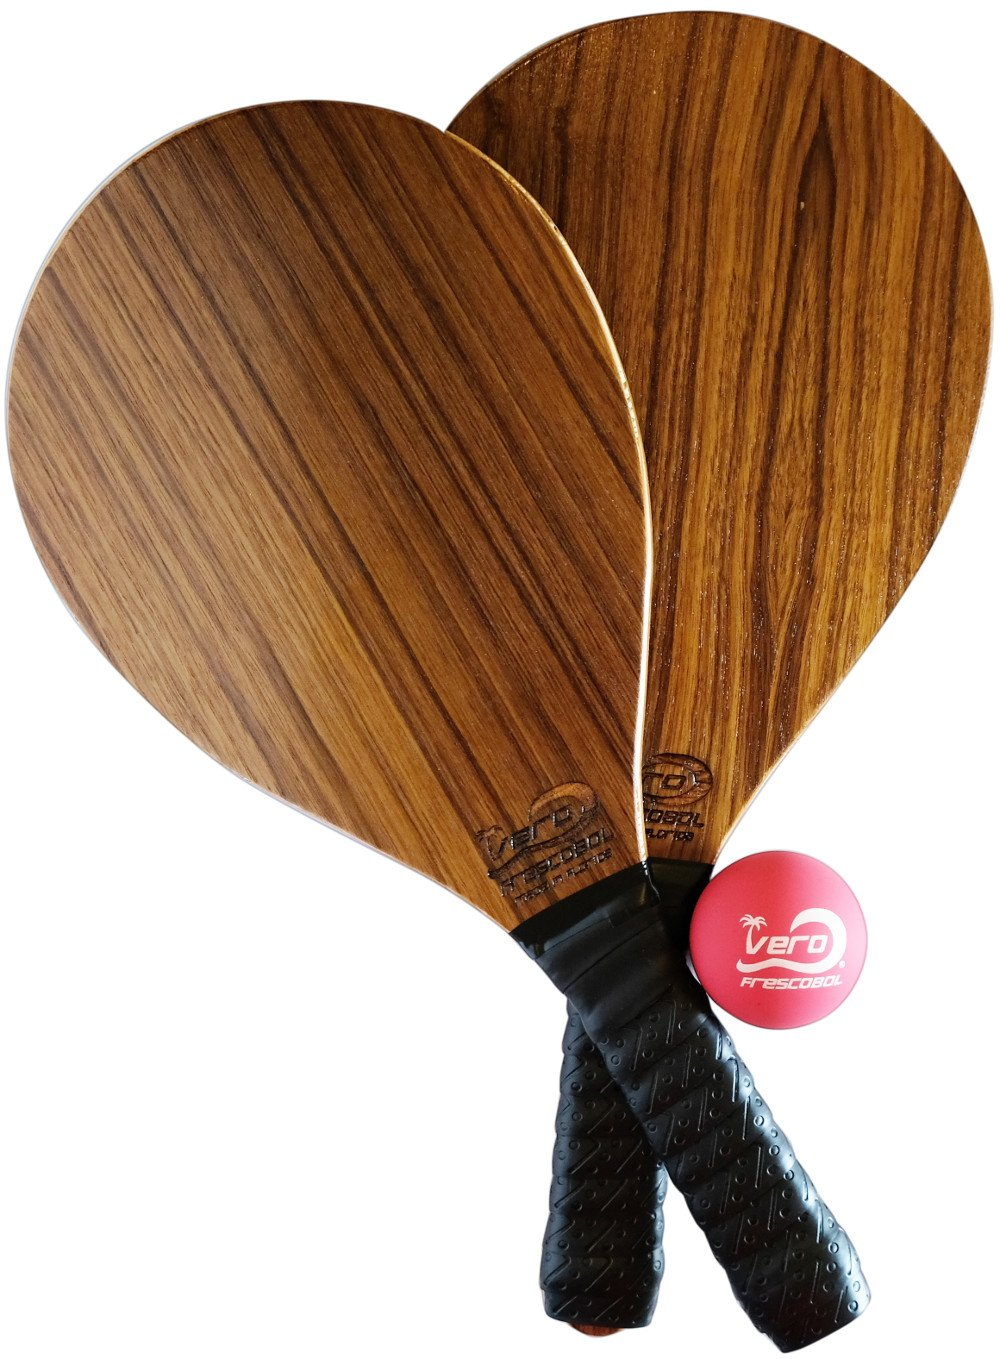 Frescobol Exotic Teak Wood Paddle Set, Official Ball, Beach Bag, Made in USA